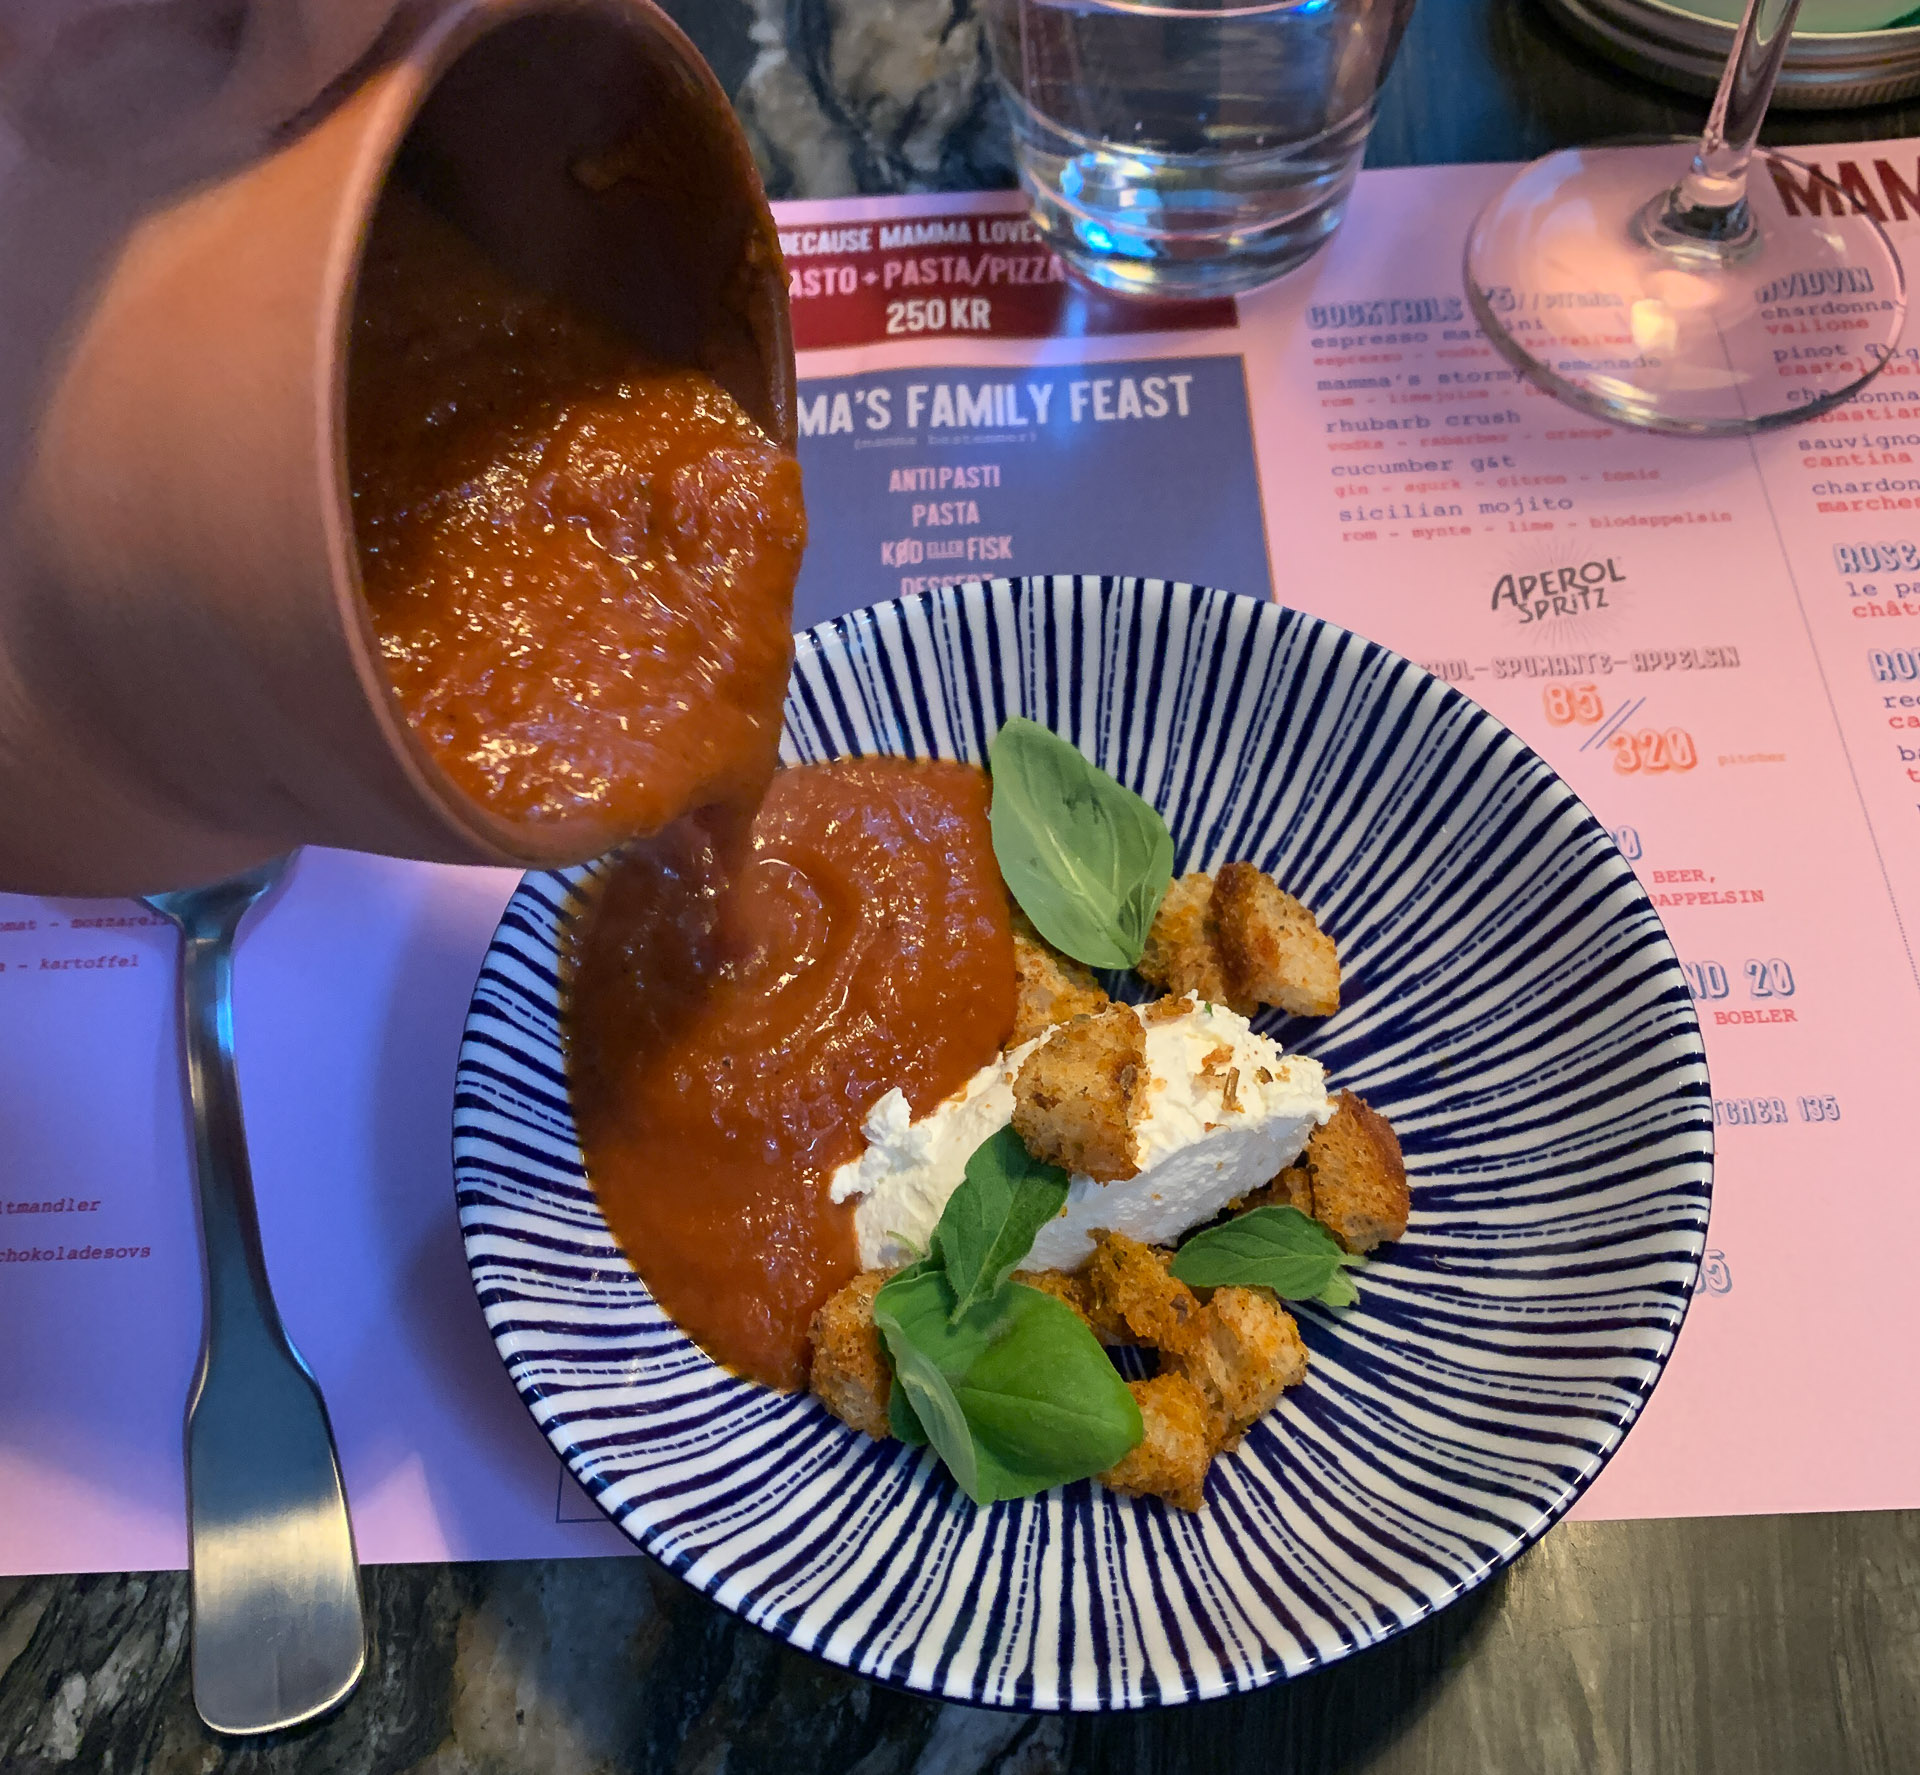 Se billederne: Madklubbens italienske Mamma åbner i dag i Aarhus